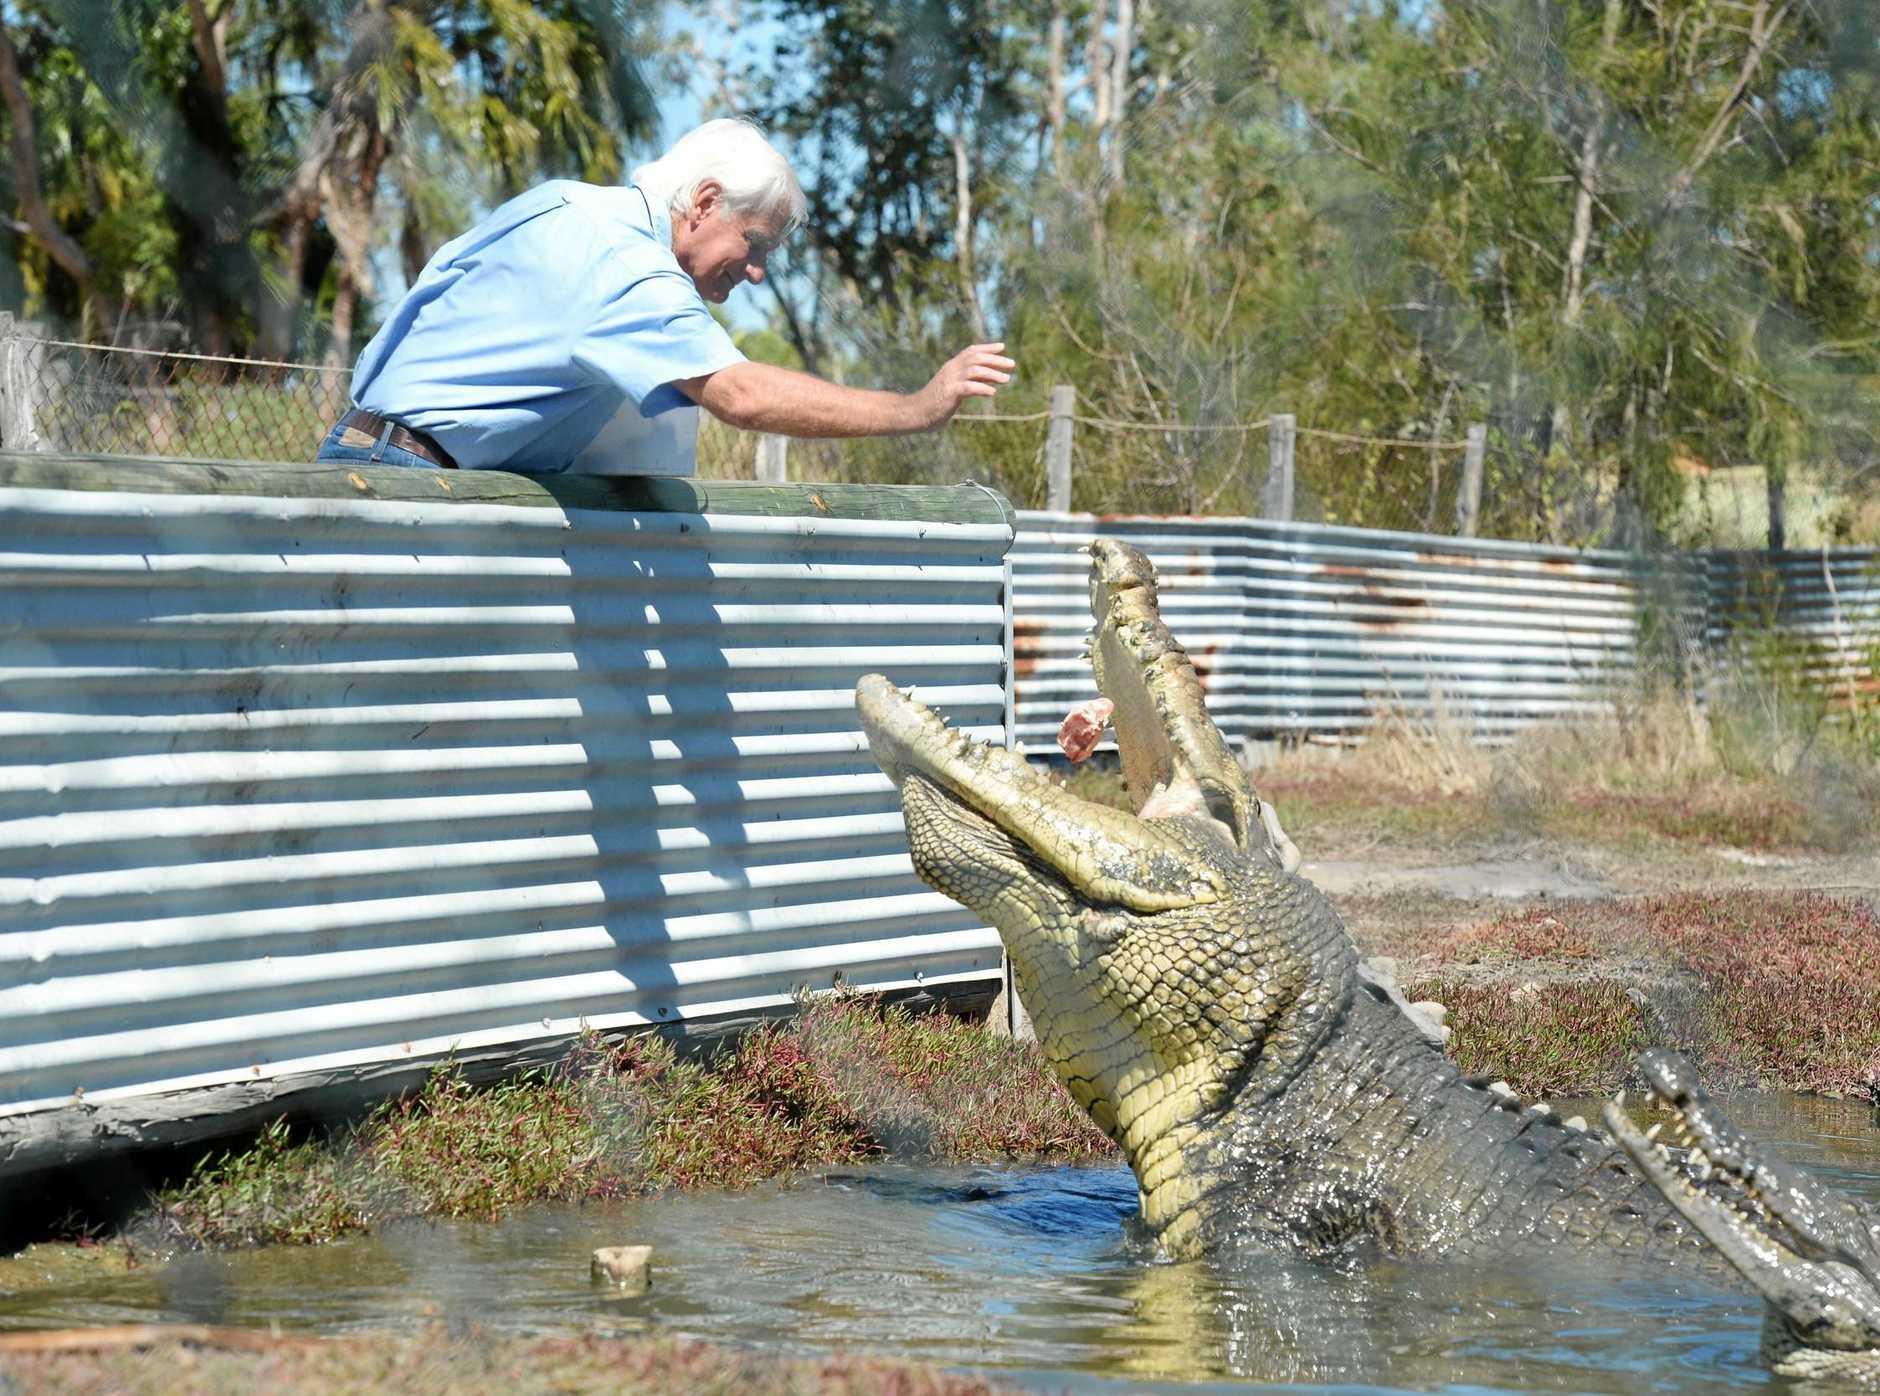 Koorana crocodile farm owner John Lever feeds Buka, a one tonne crocodile. Photo Rachael Conaghan/The Morning Bulletin